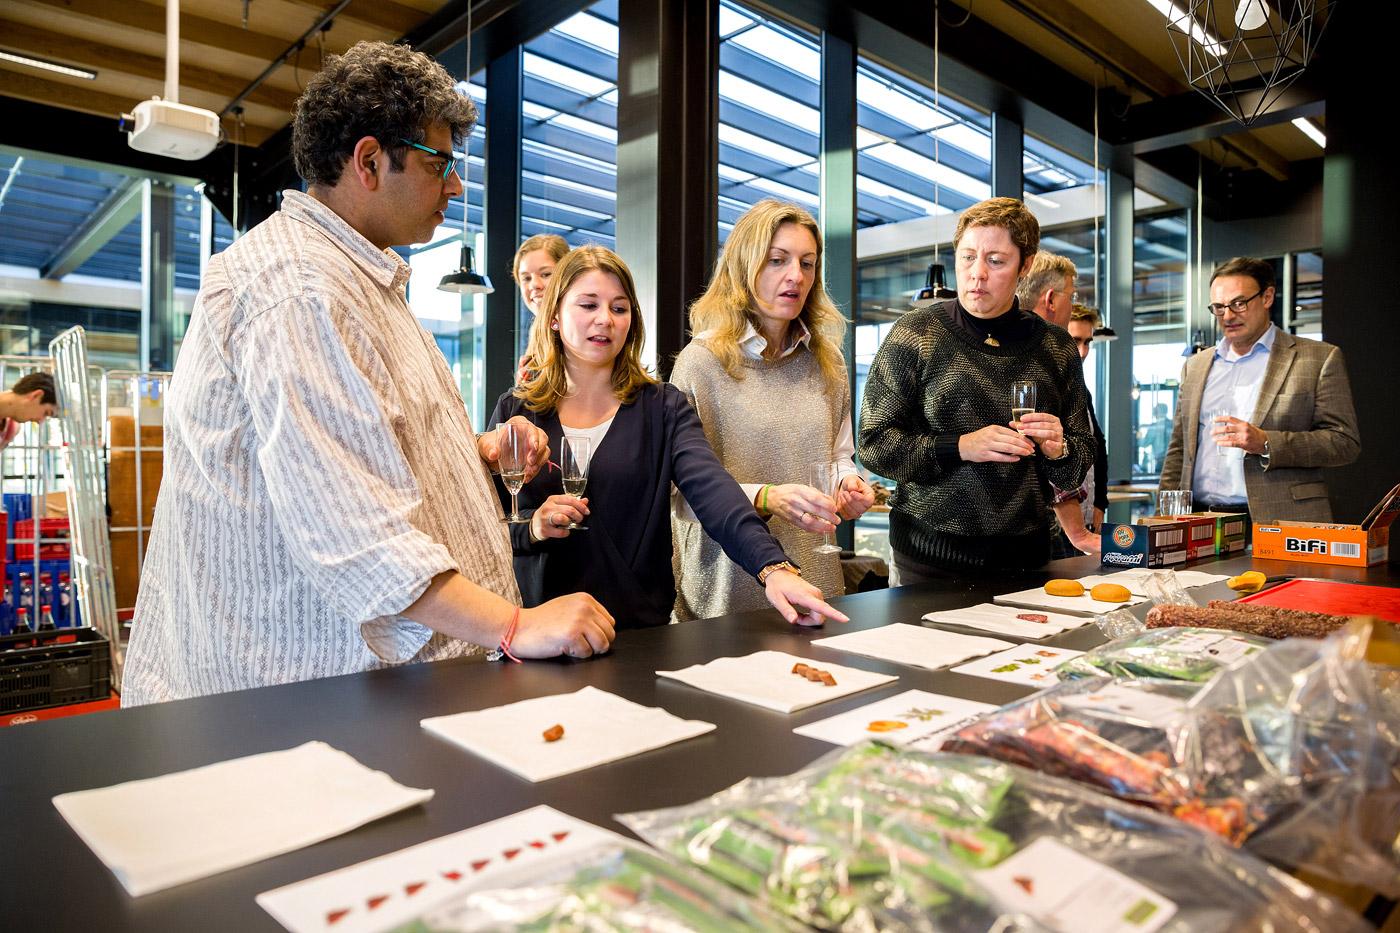 jacklinks-bifi-peperami-amsterdam-Bob-hersbach-fotograaf-receptie-hoofdkantoor-opening-foodtasting